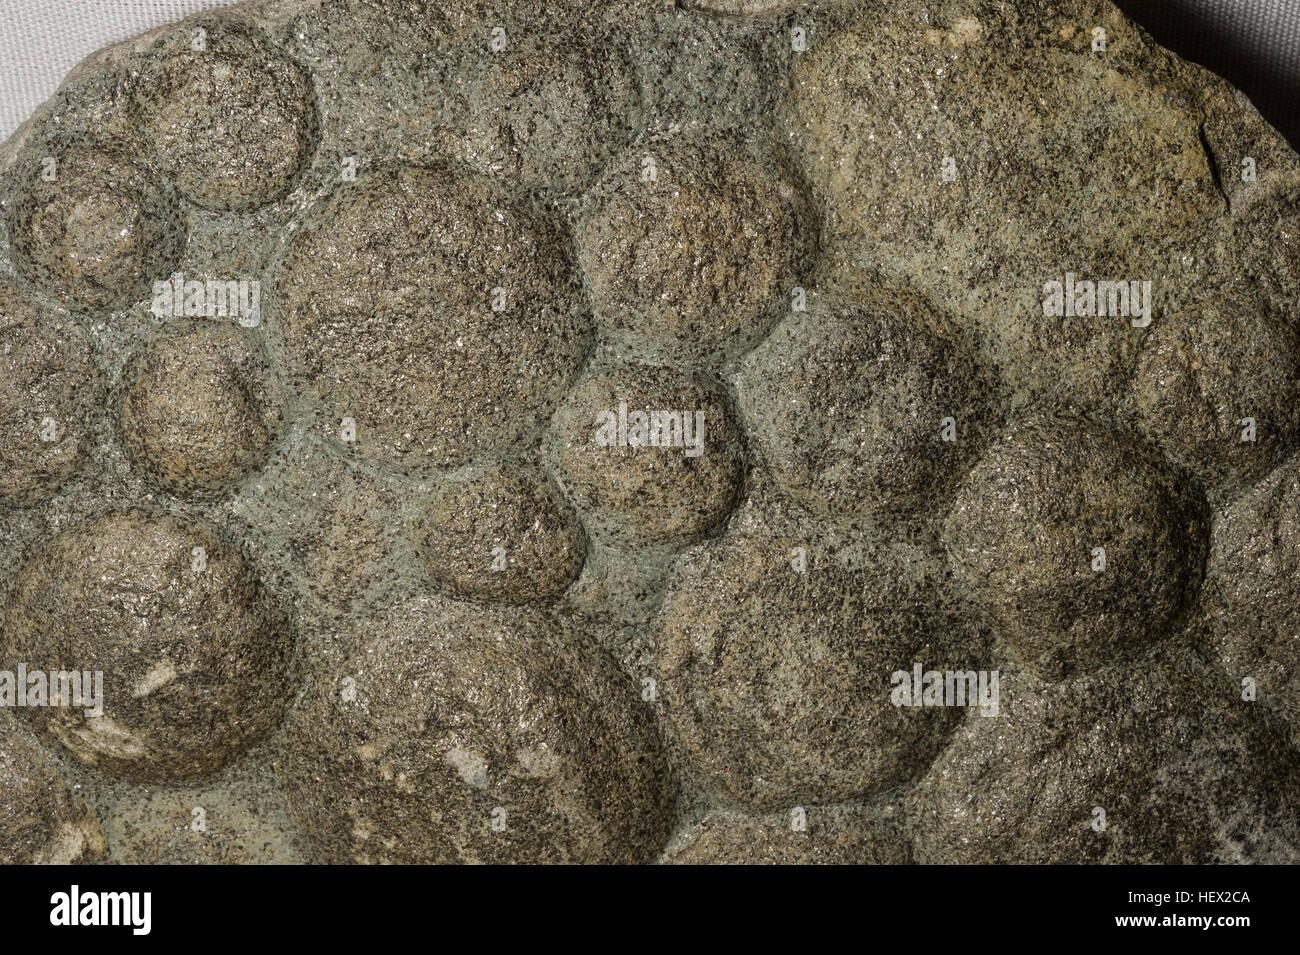 Fossil organism, Nemiana simplex, Ediacaran, Kamenez-Podolskiy, Ukraina - Stock Image